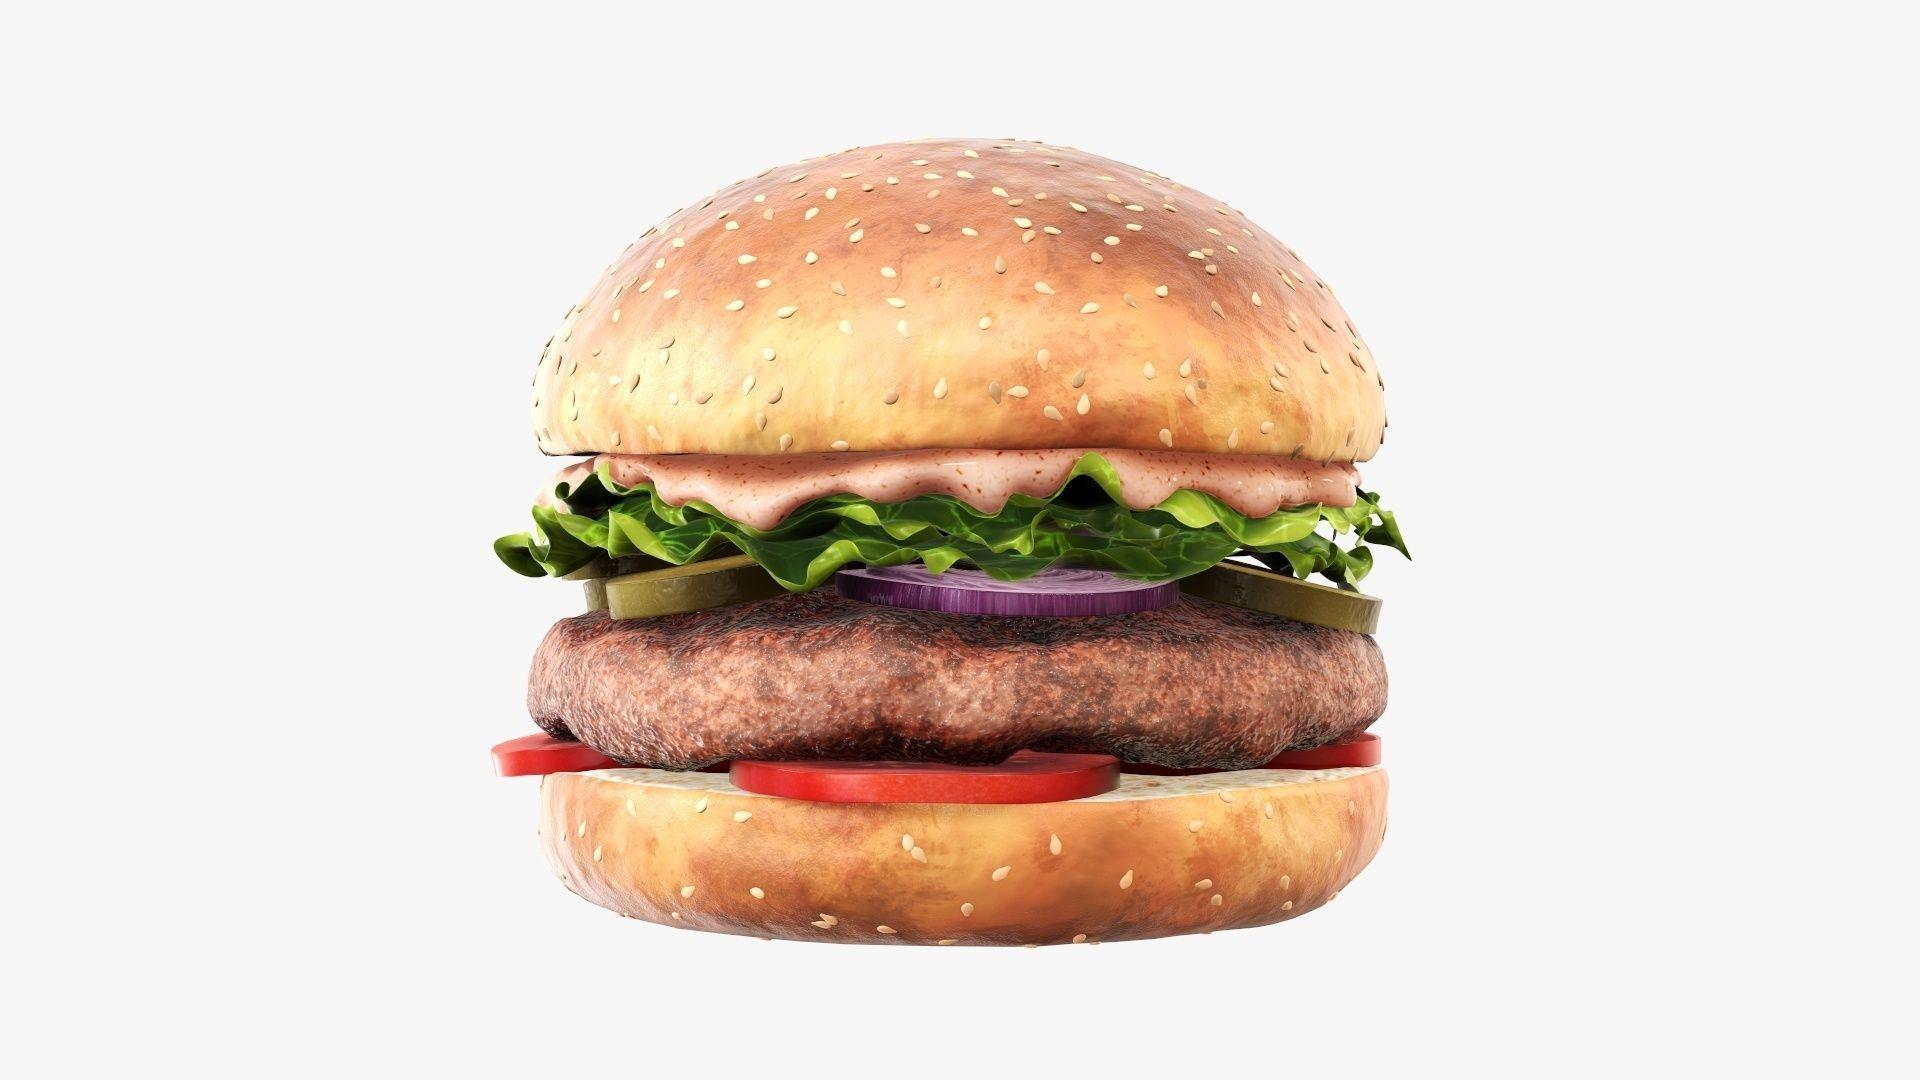 Fast food hamburger 02